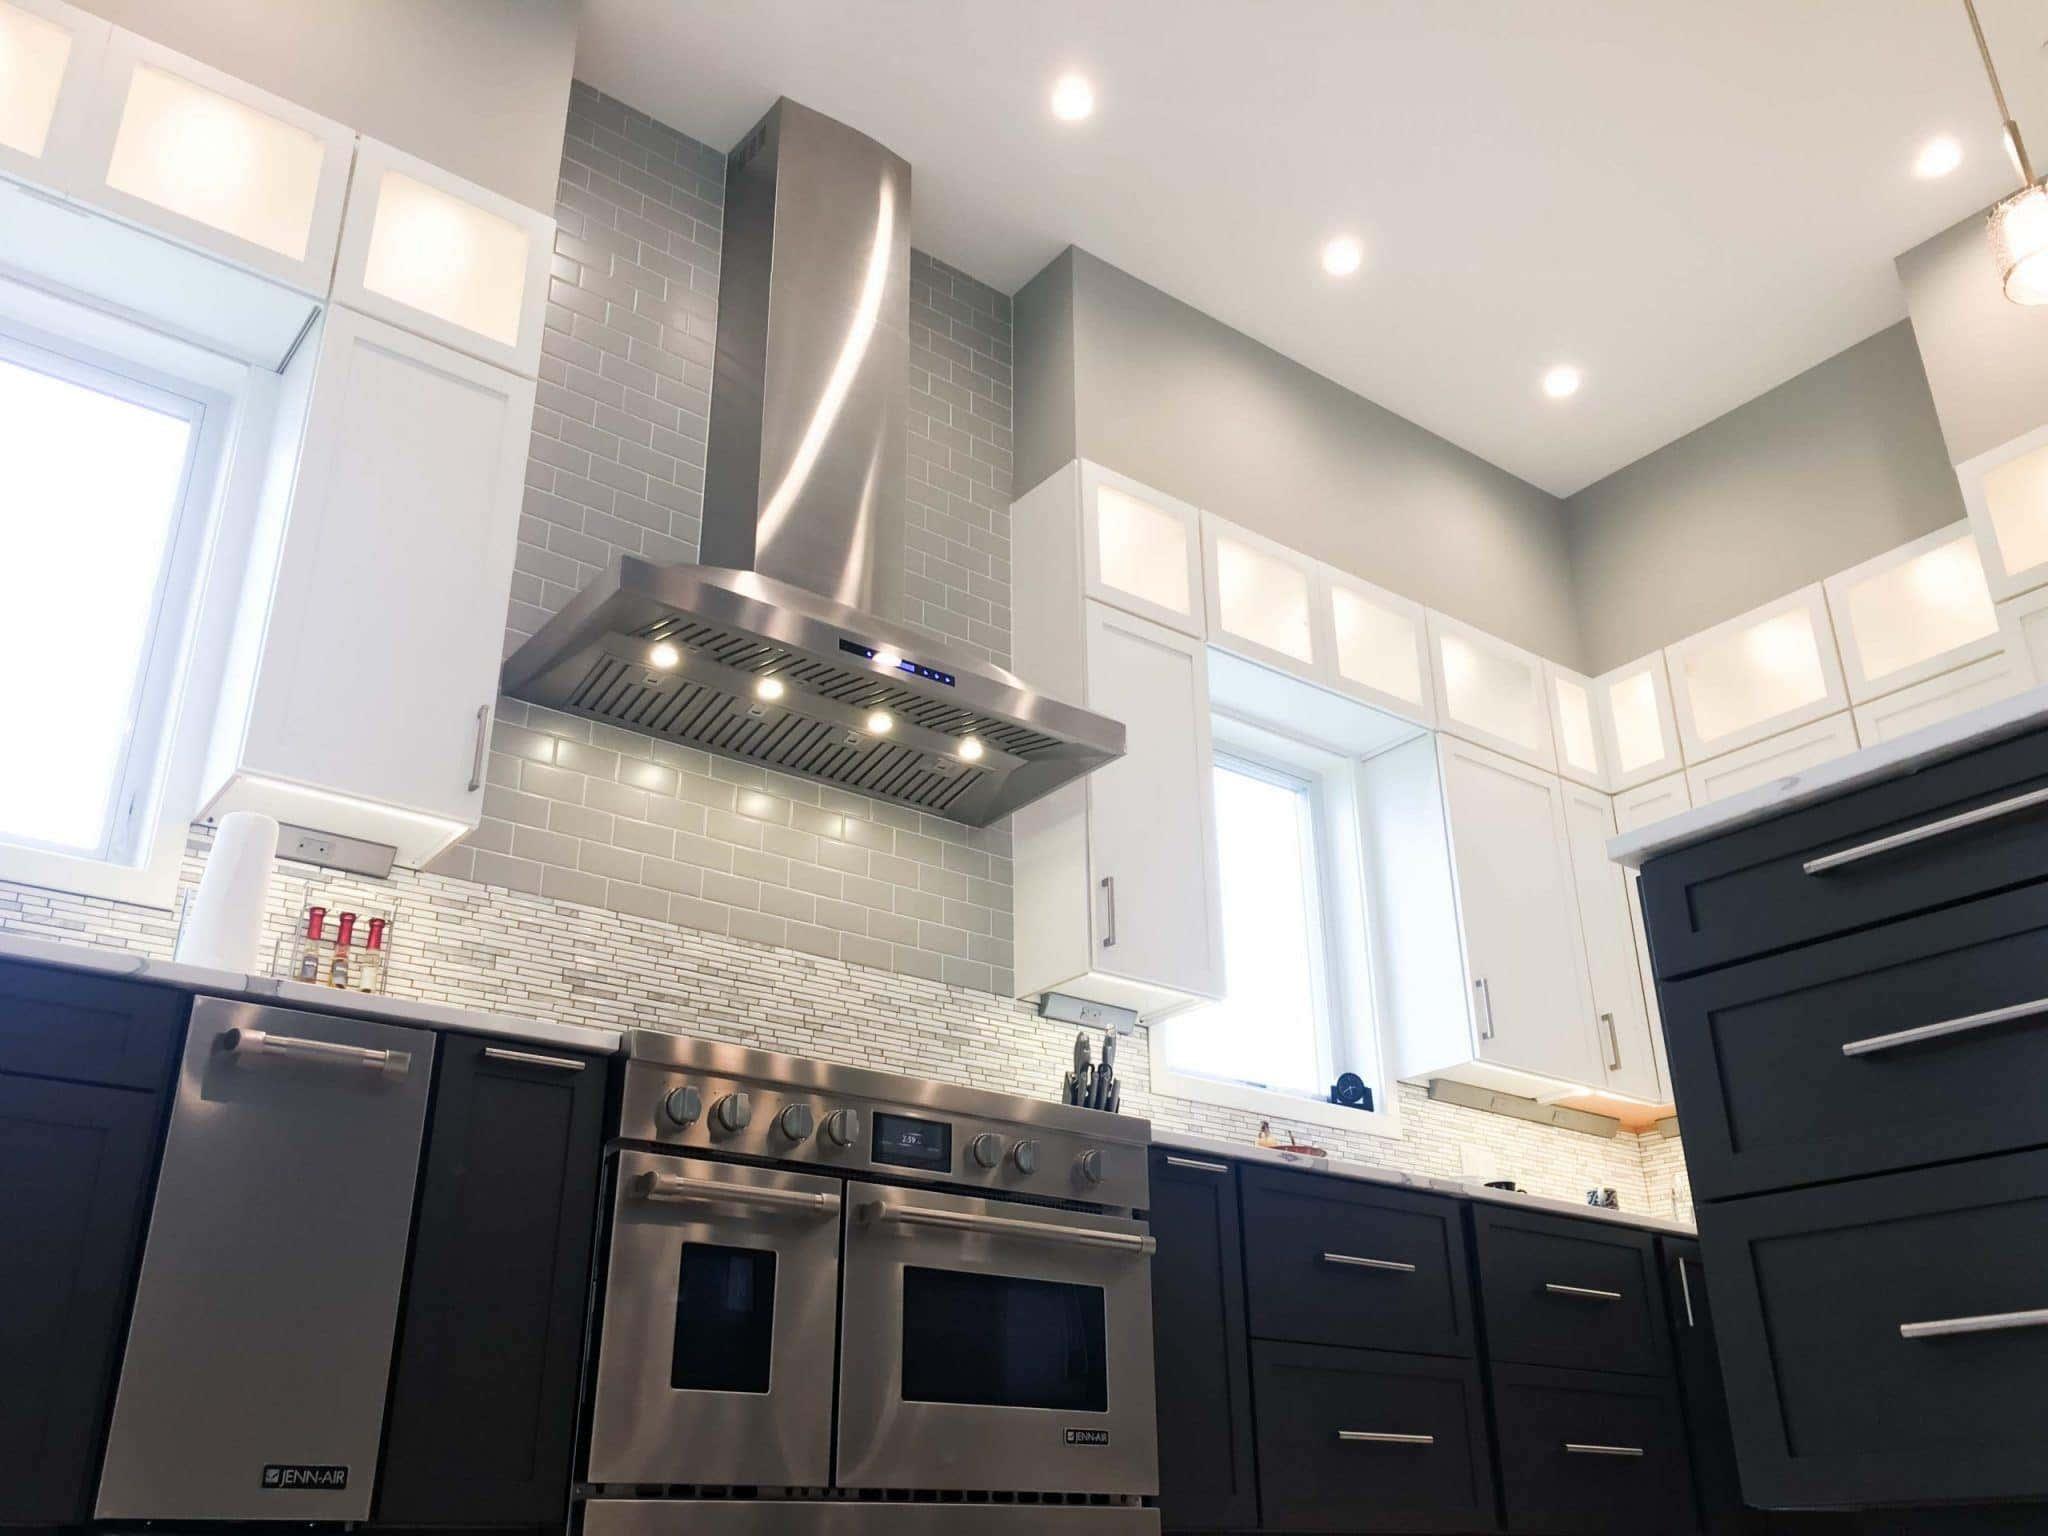 10 Trending Kitchen Design Ideas That We Love In 2020